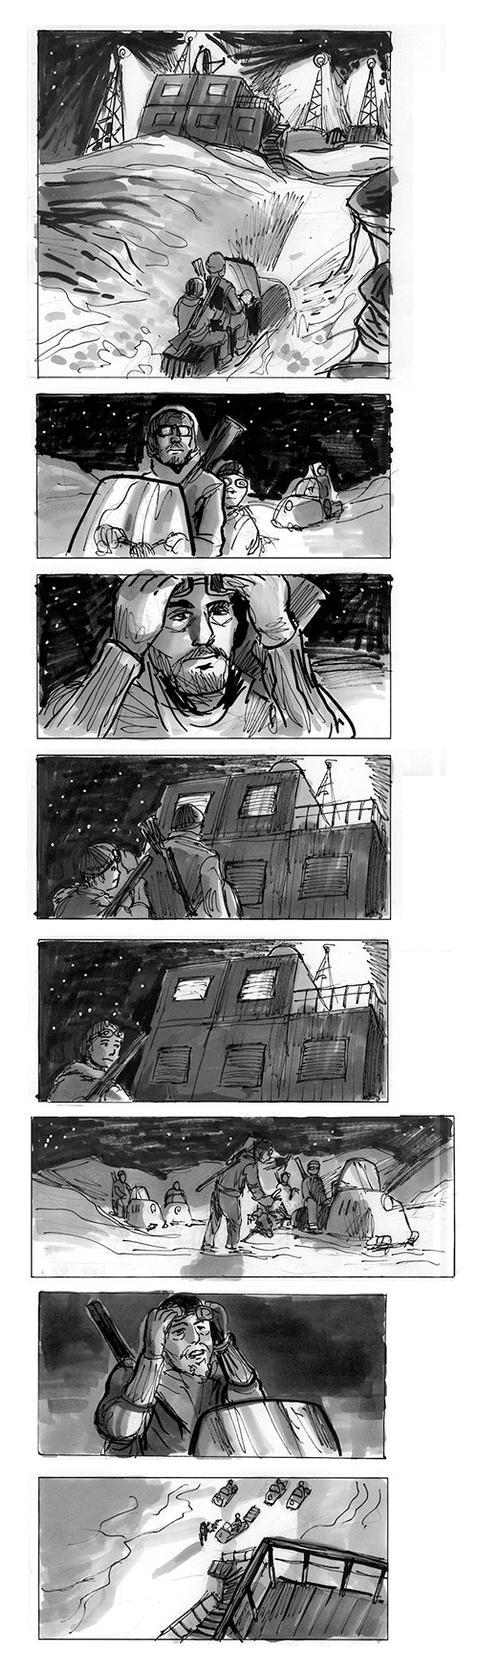 Rare Exports storyboard 1 by jjnaas